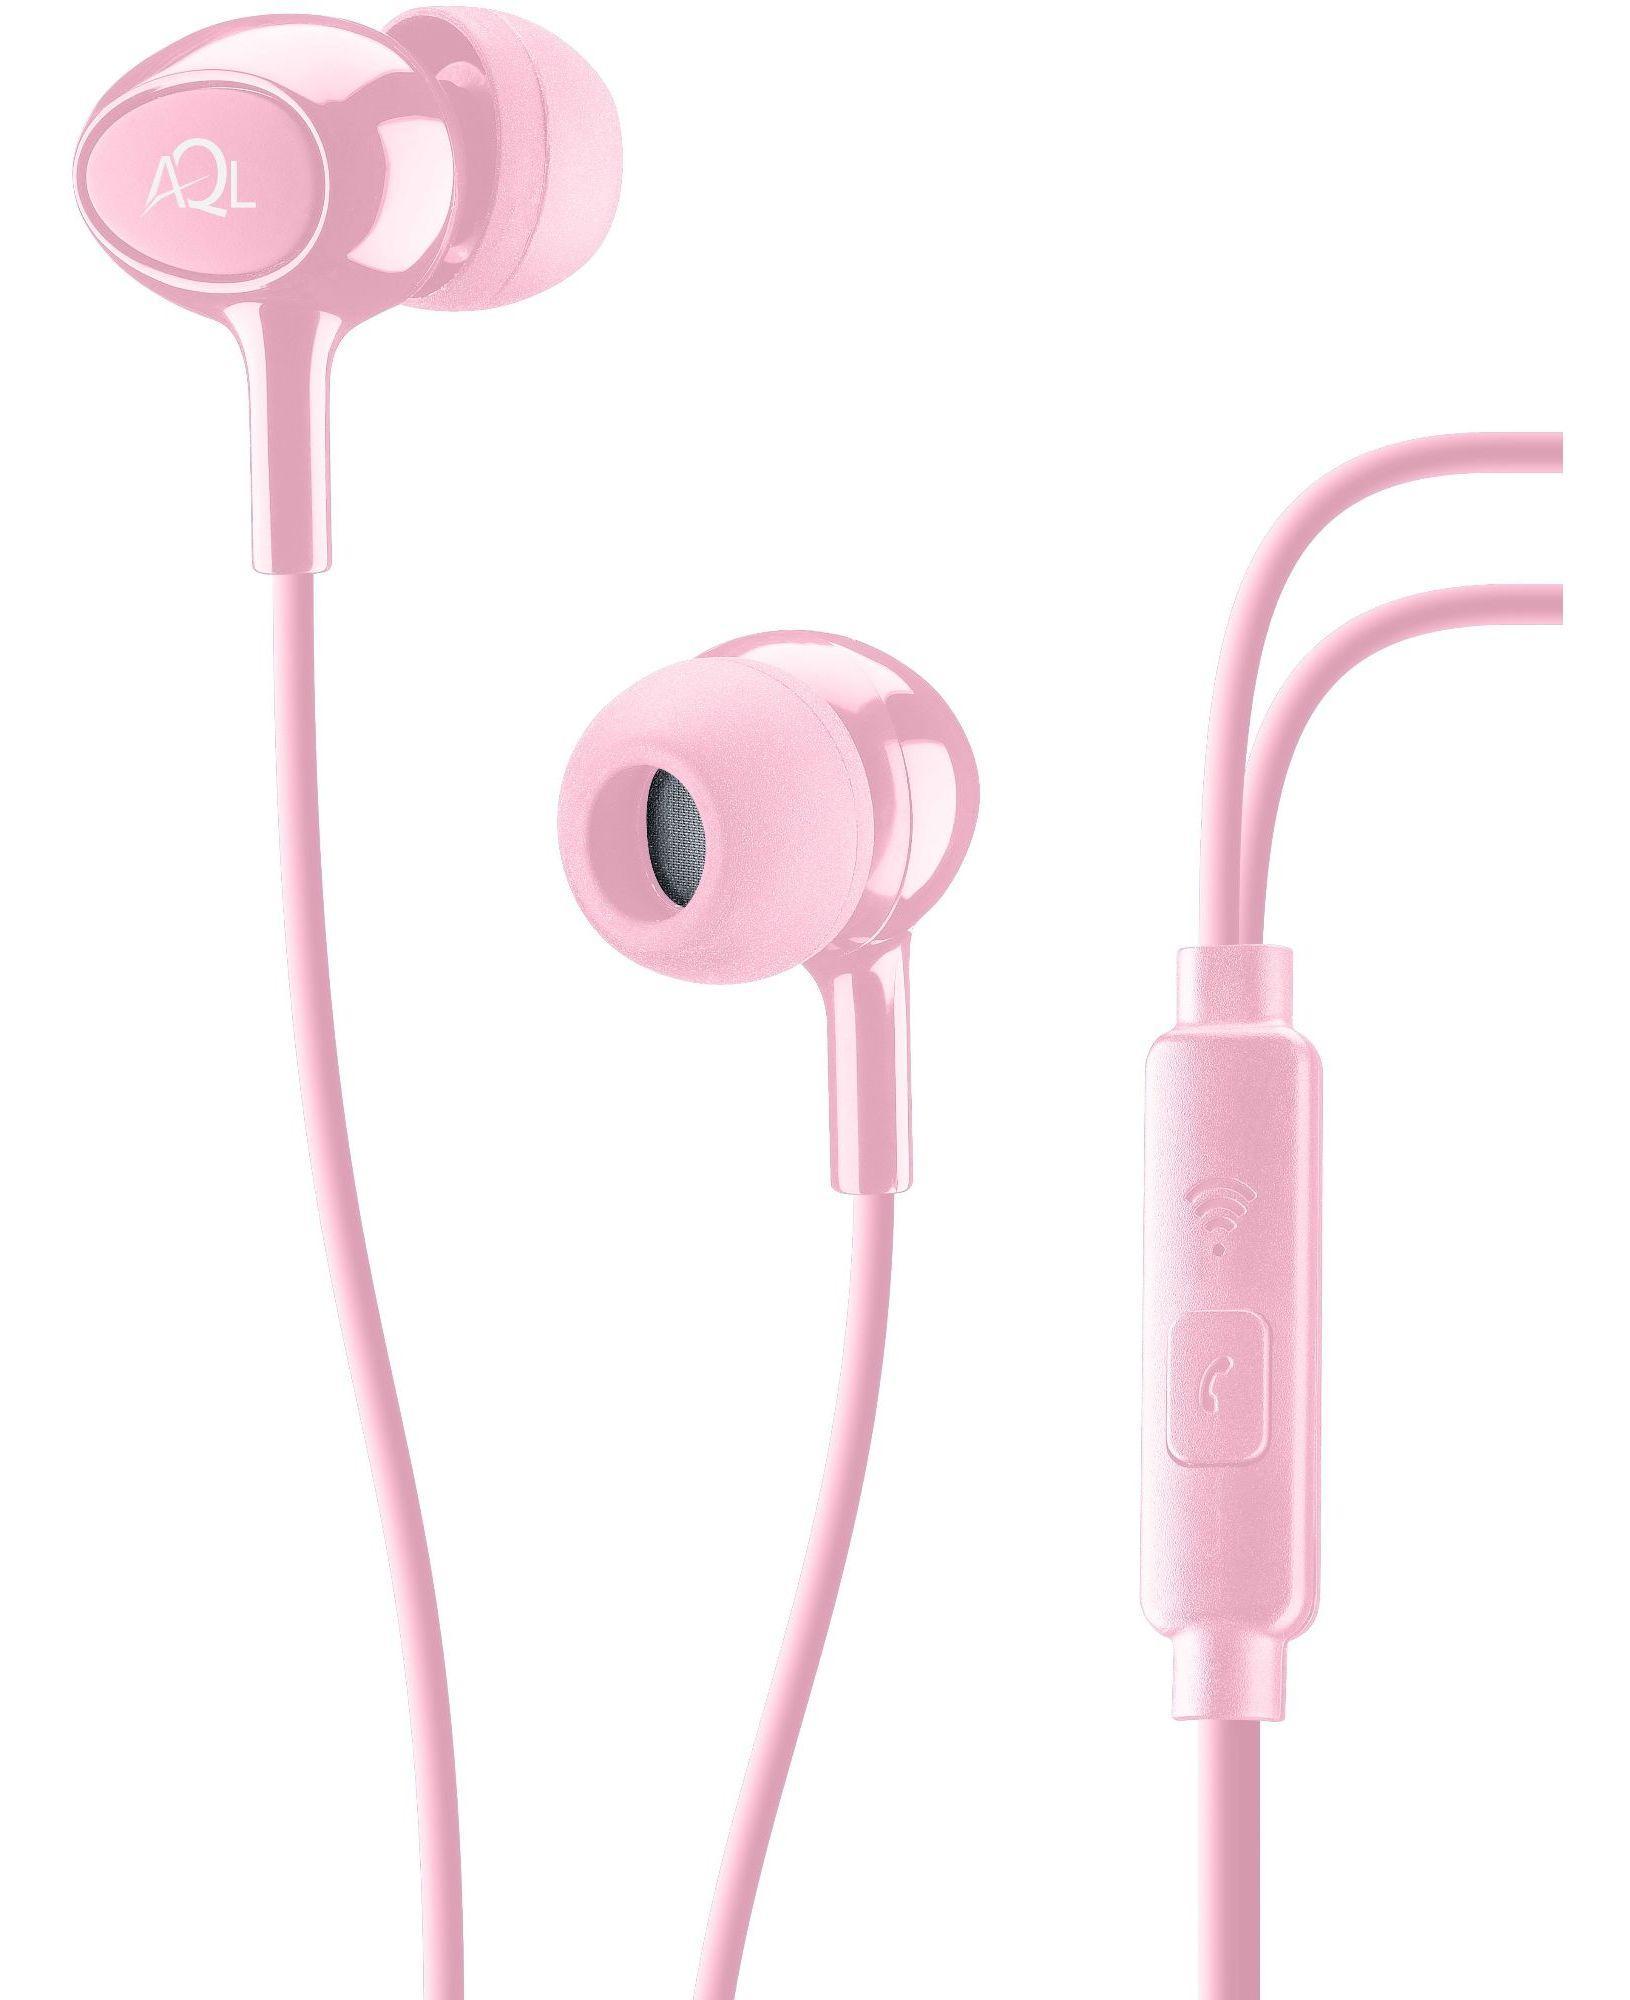 Cellularline Acoustic - Universale Auricolari pump bass in-ear Rosa